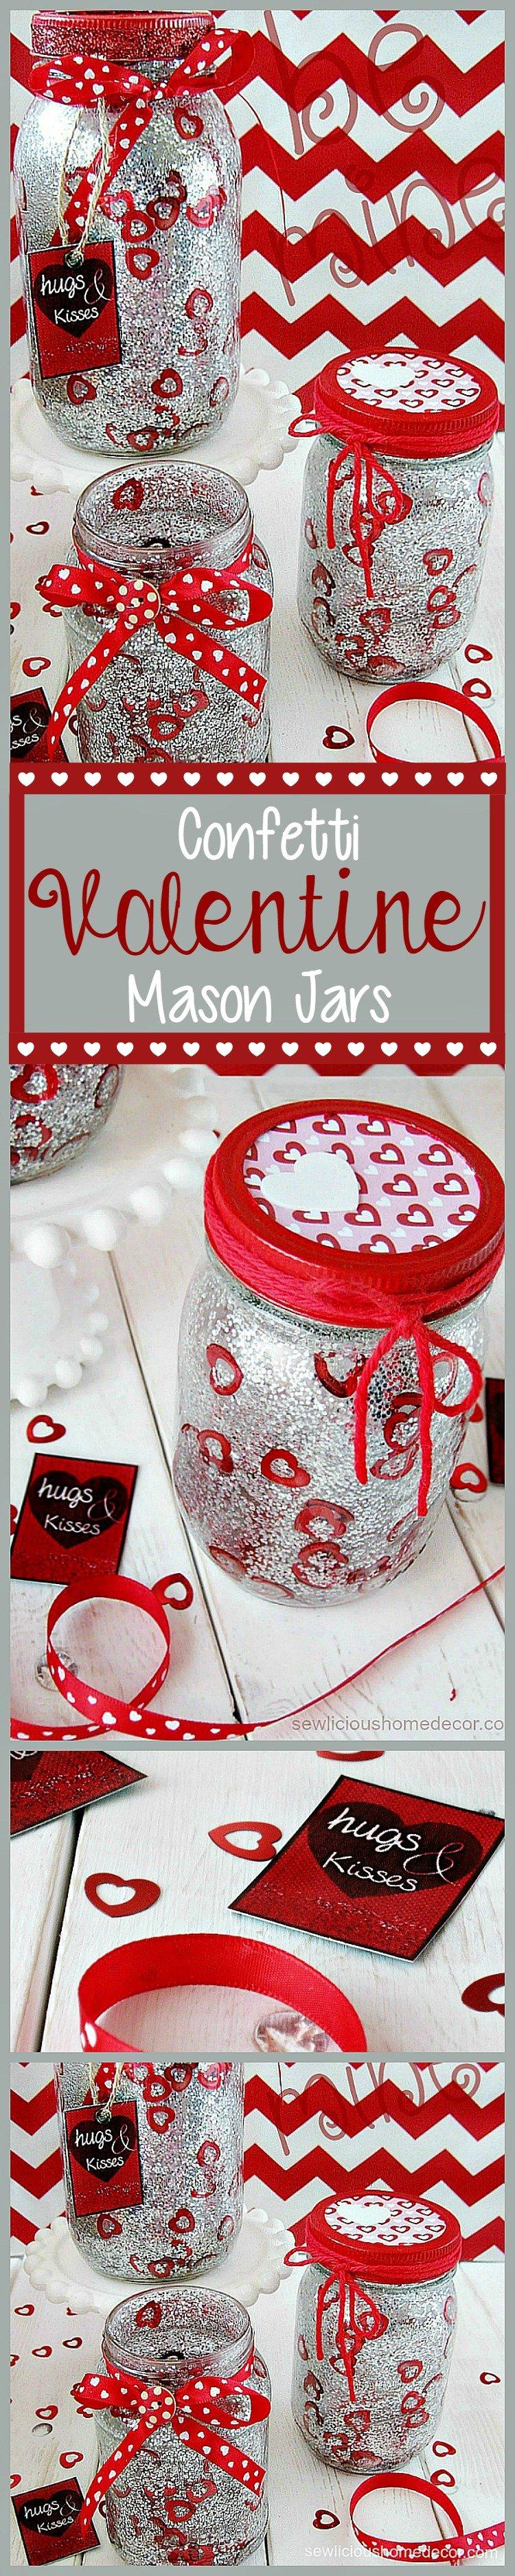 Confetti Mason Jars sewlicioushomedecor